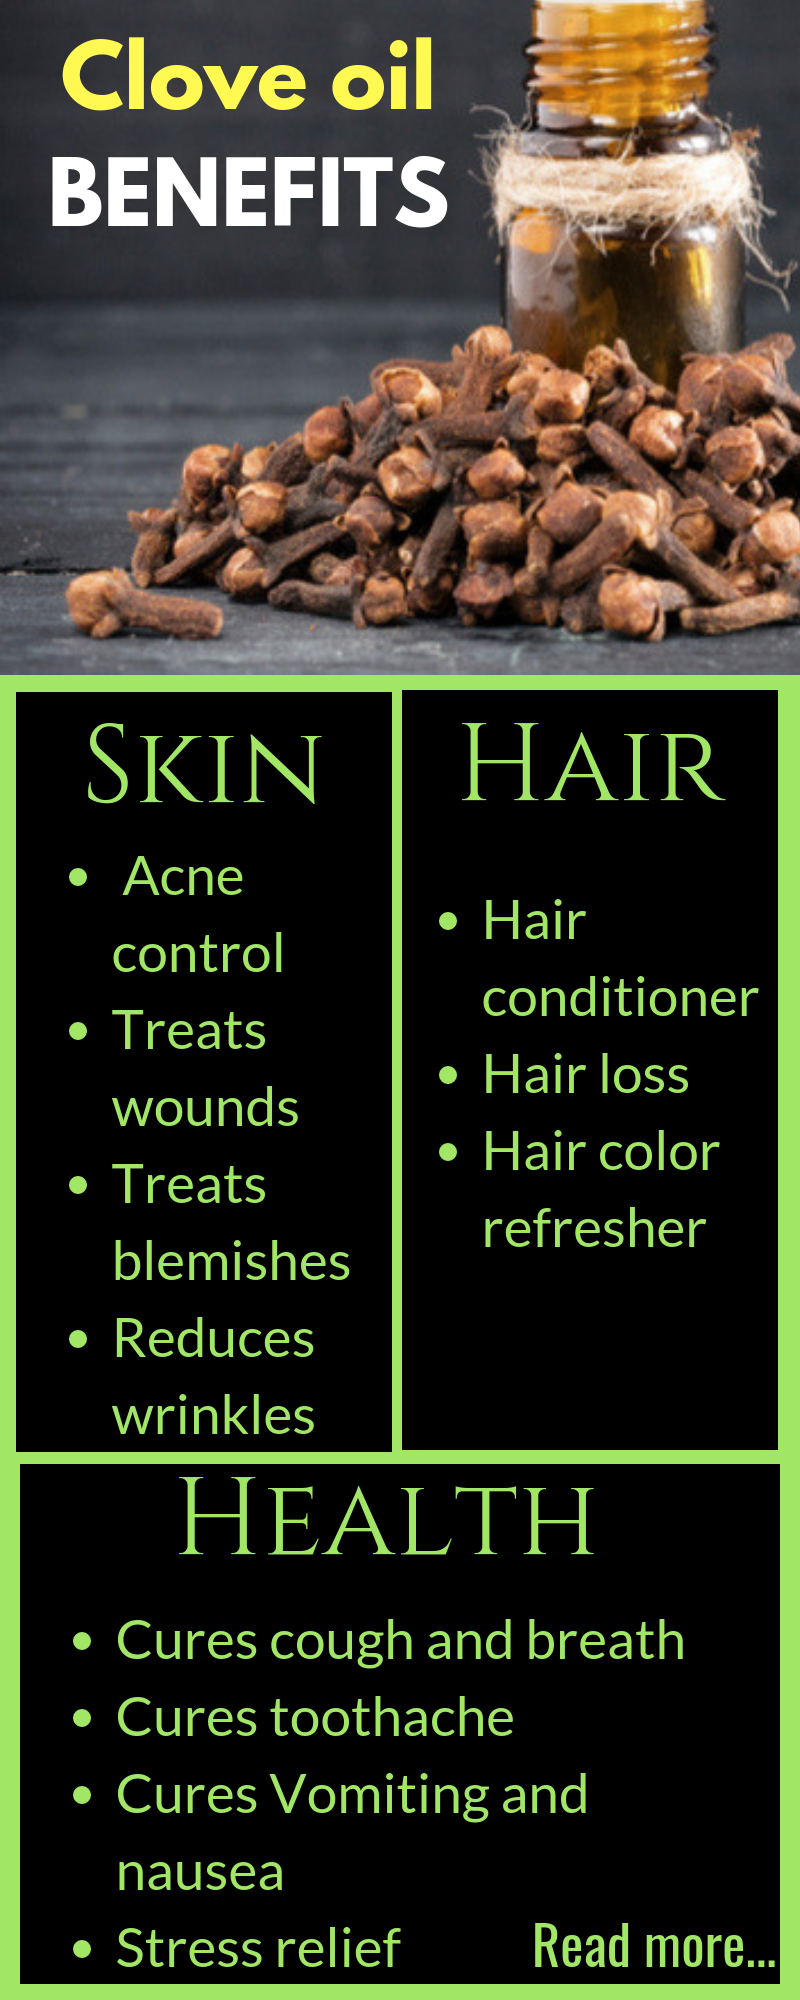 Amazing benefits of clove oil #hairhealth